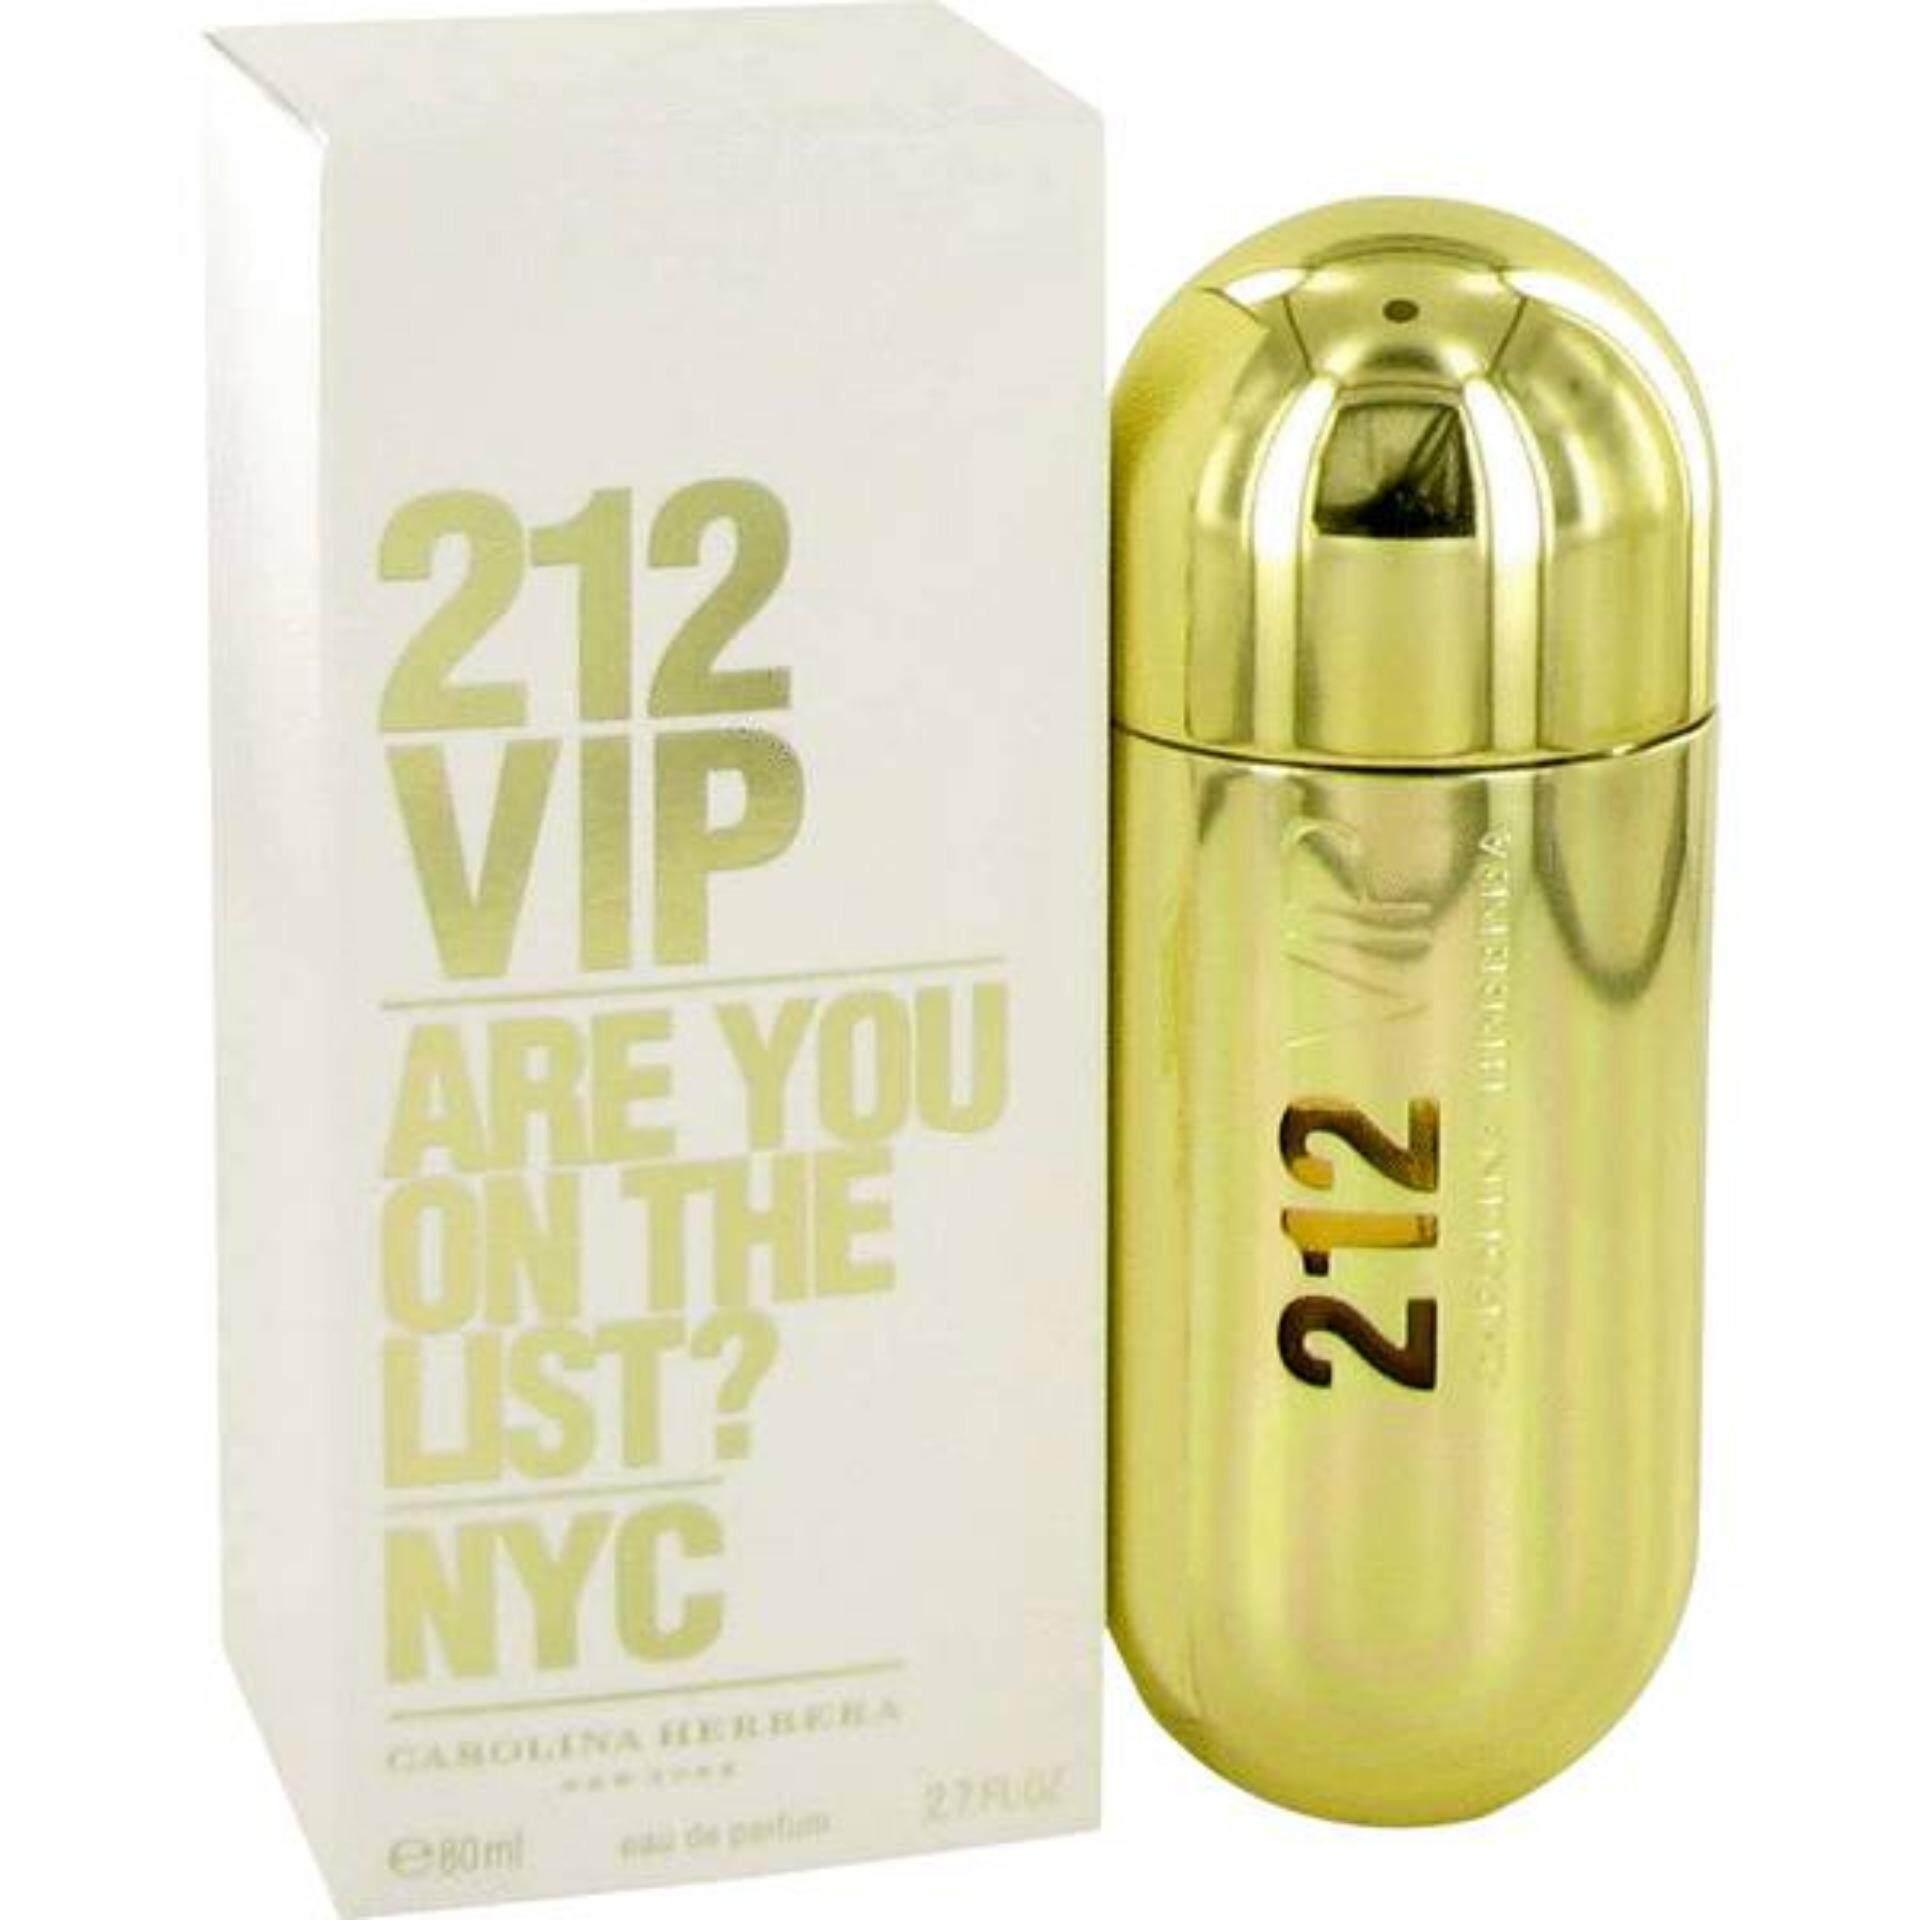 212 vip silver gold 5A